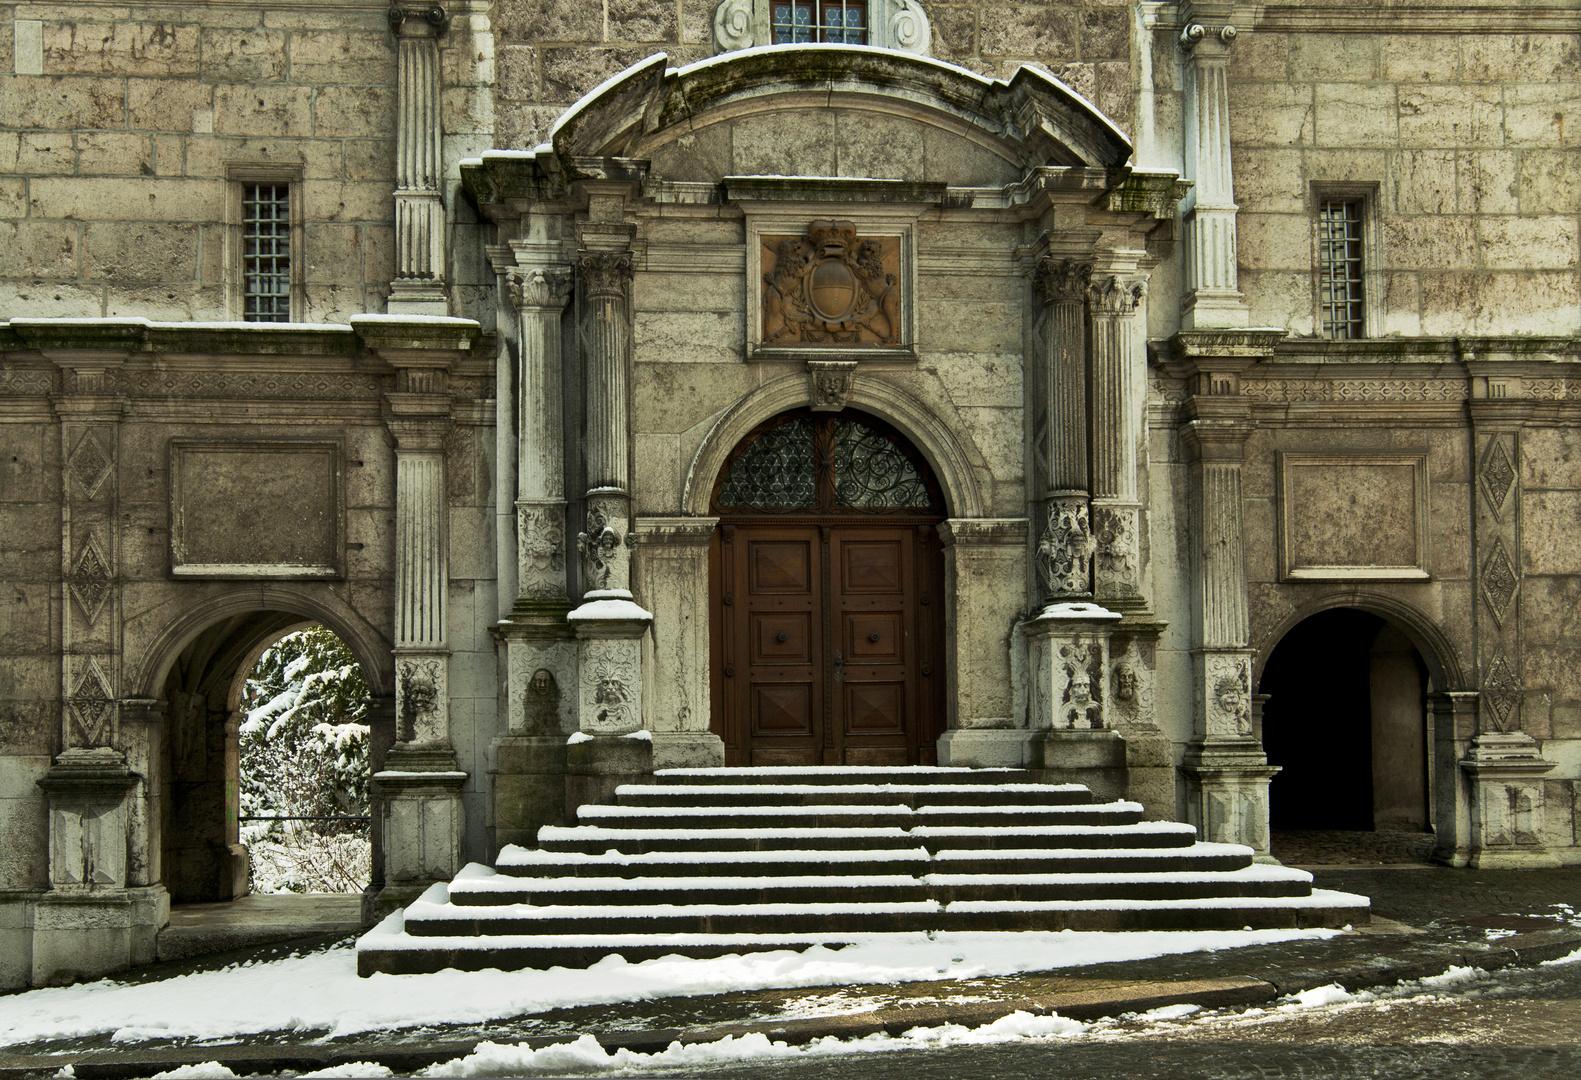 Solothurn barocco